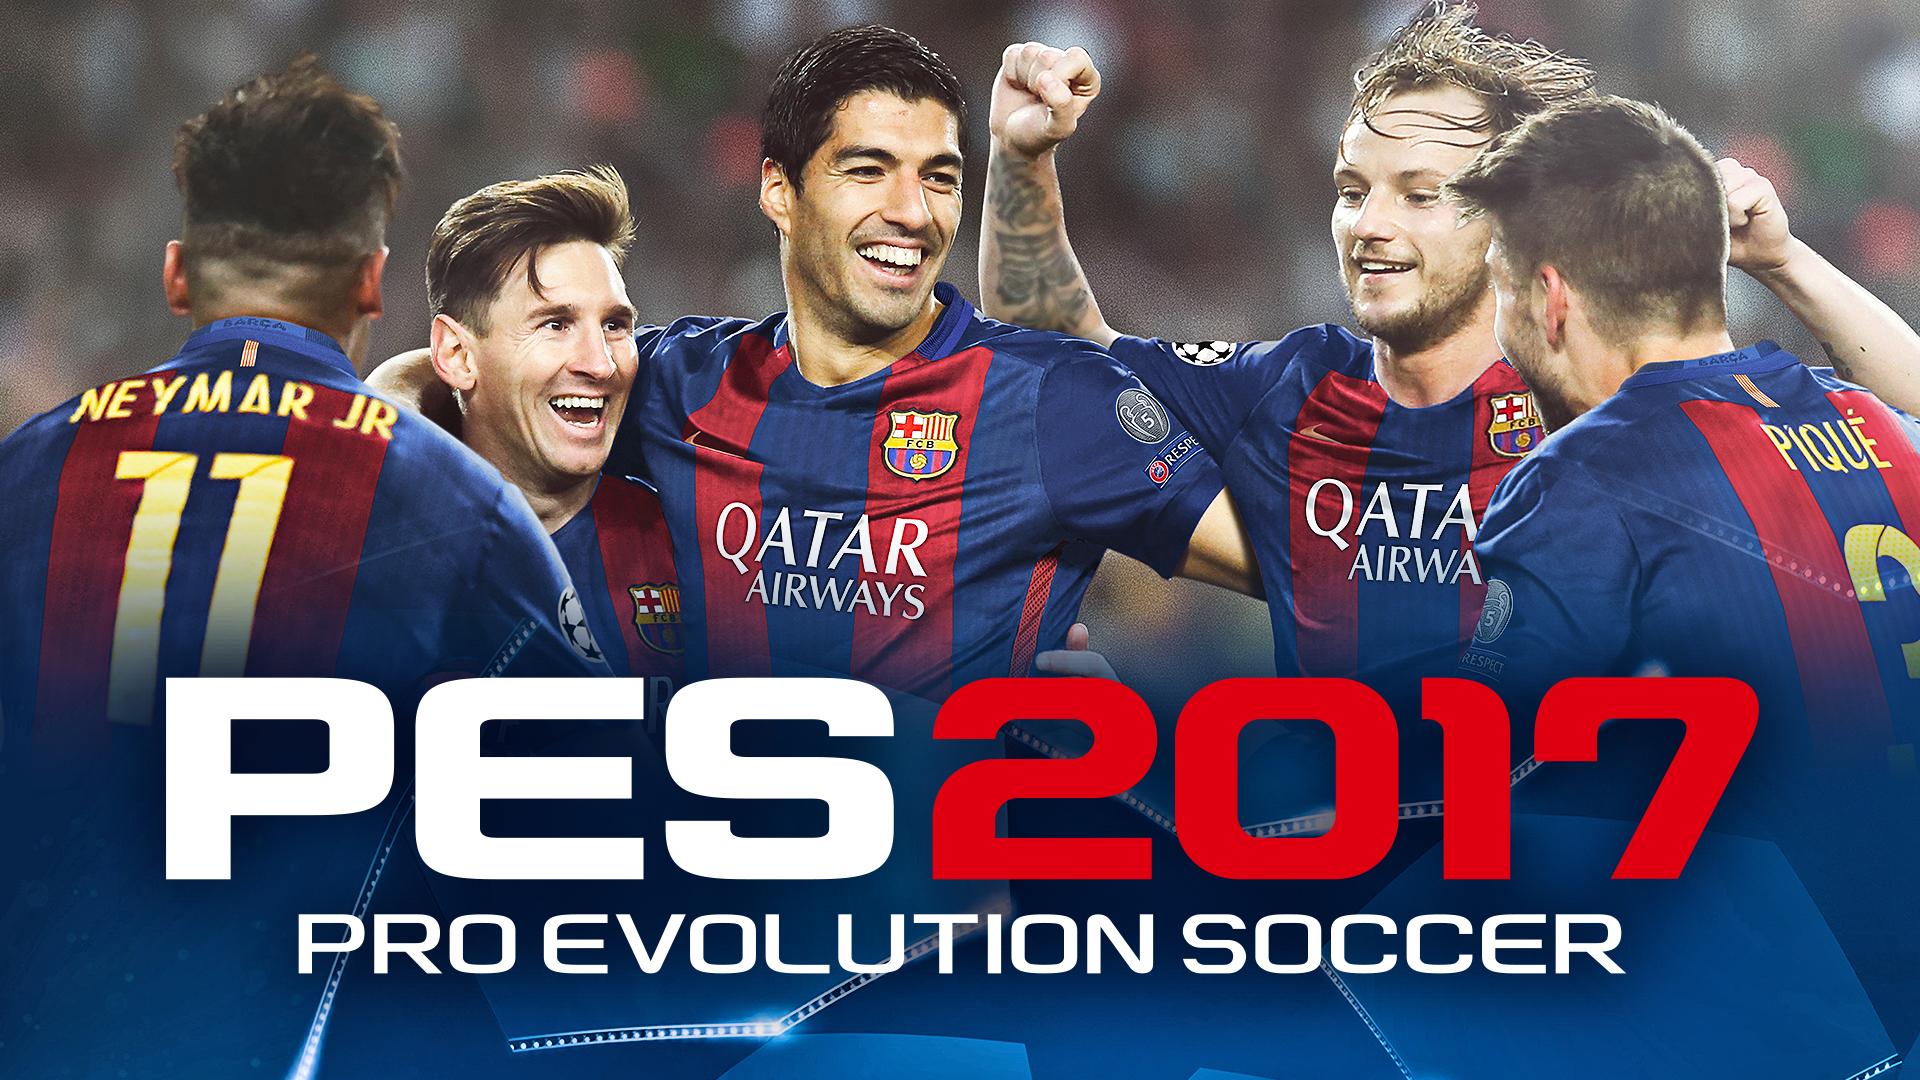 Pro evolution soccer 2017 full hd wallpaper and background image video game pro evolution soccer 2017 wallpaper voltagebd Choice Image